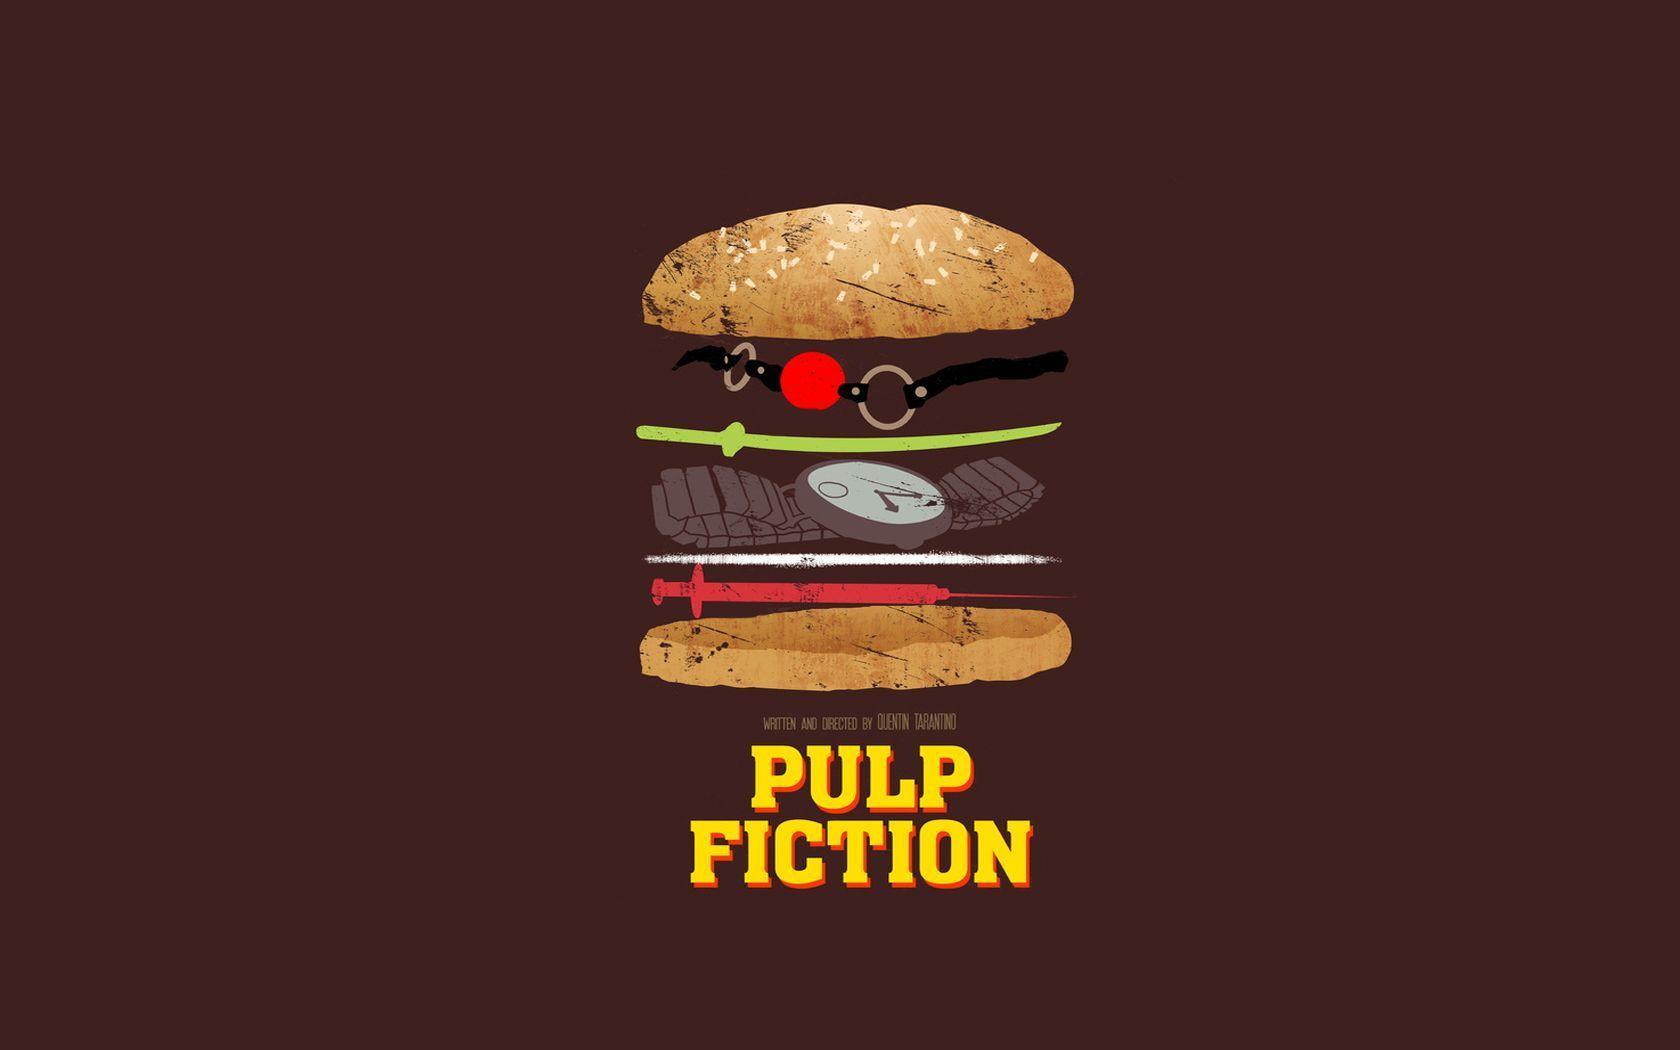 pulp fiction wallpaper iphone